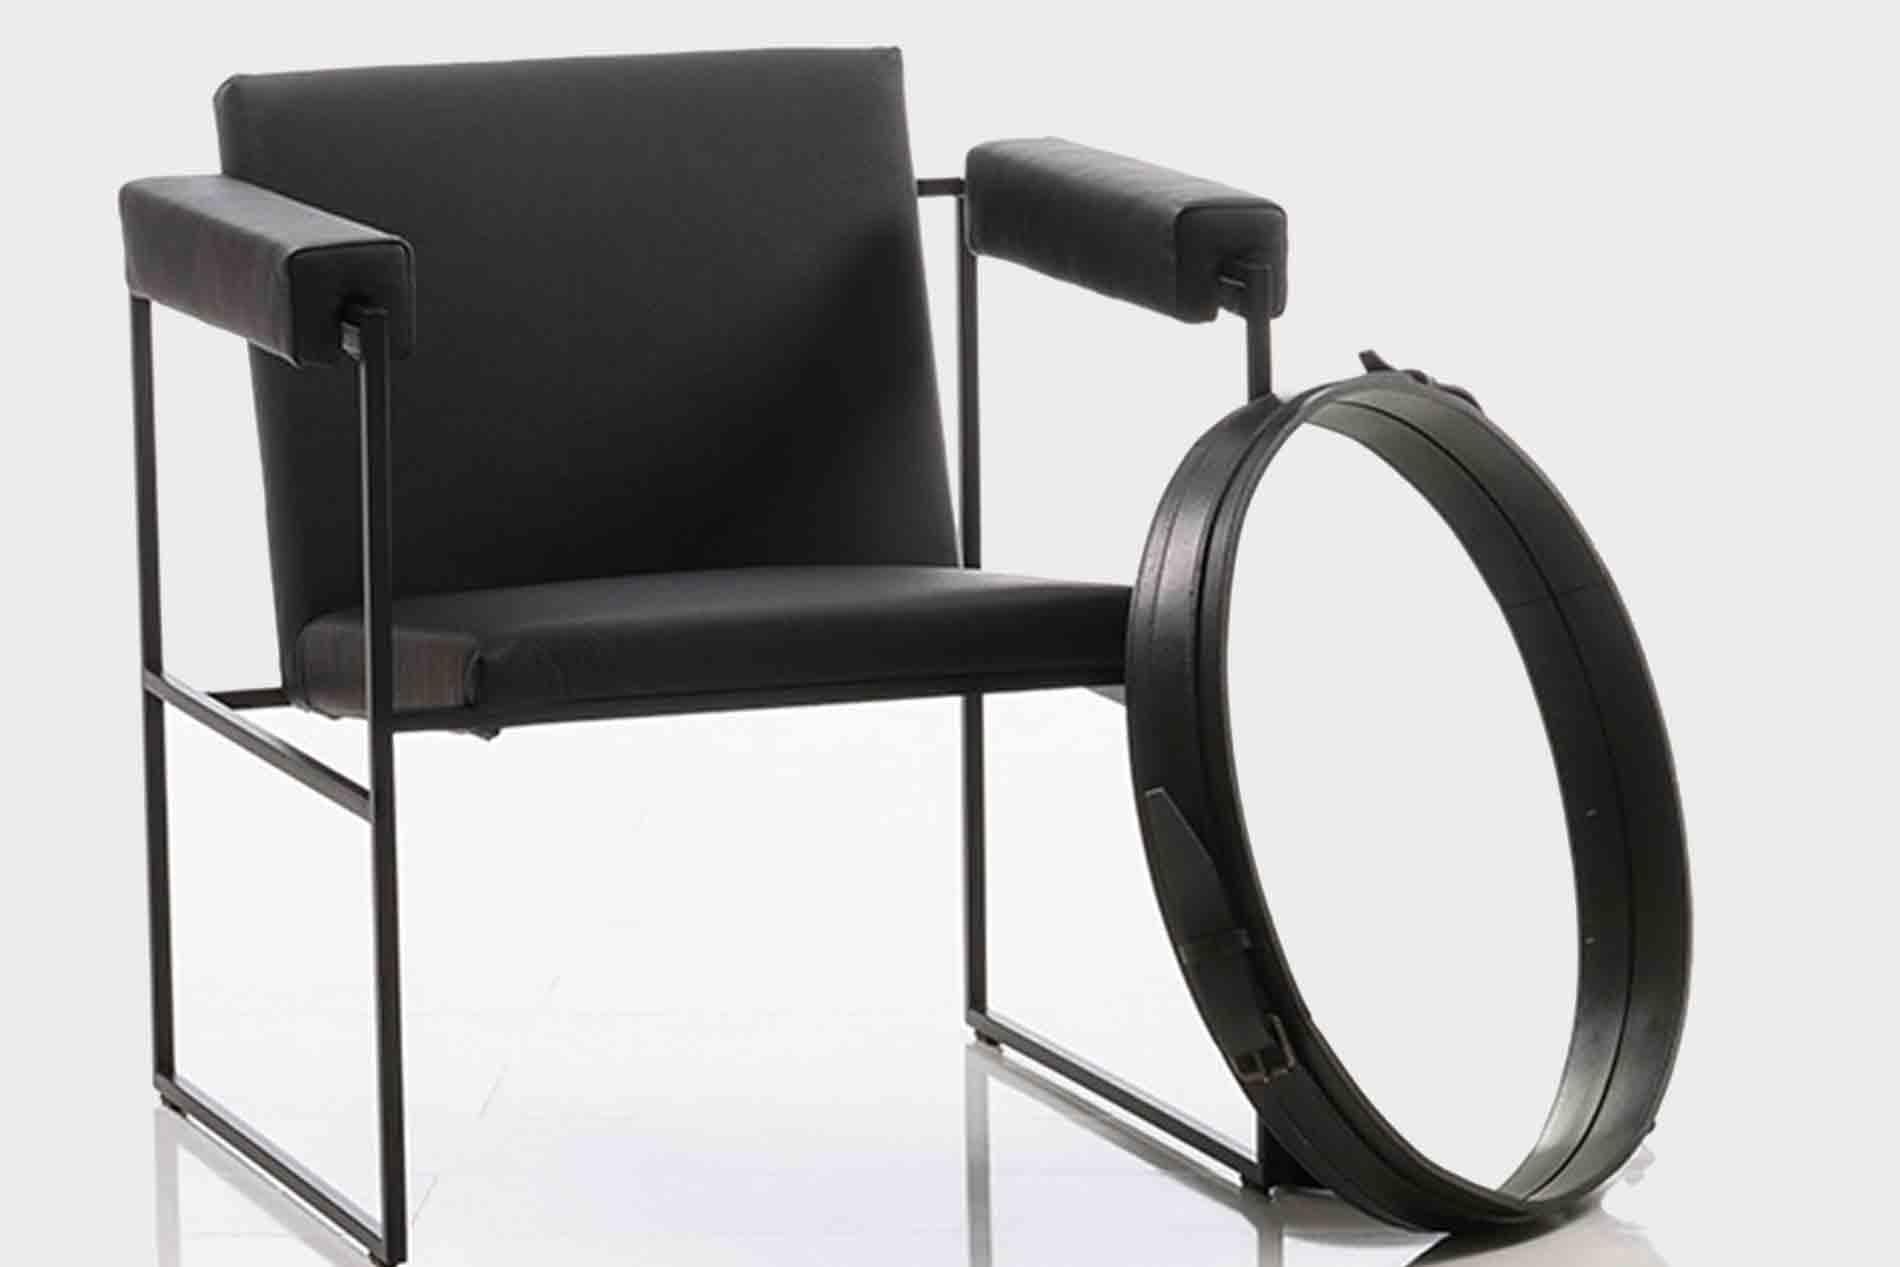 Sessel Grace von Brühl edler Sessel mit Metallrahmen